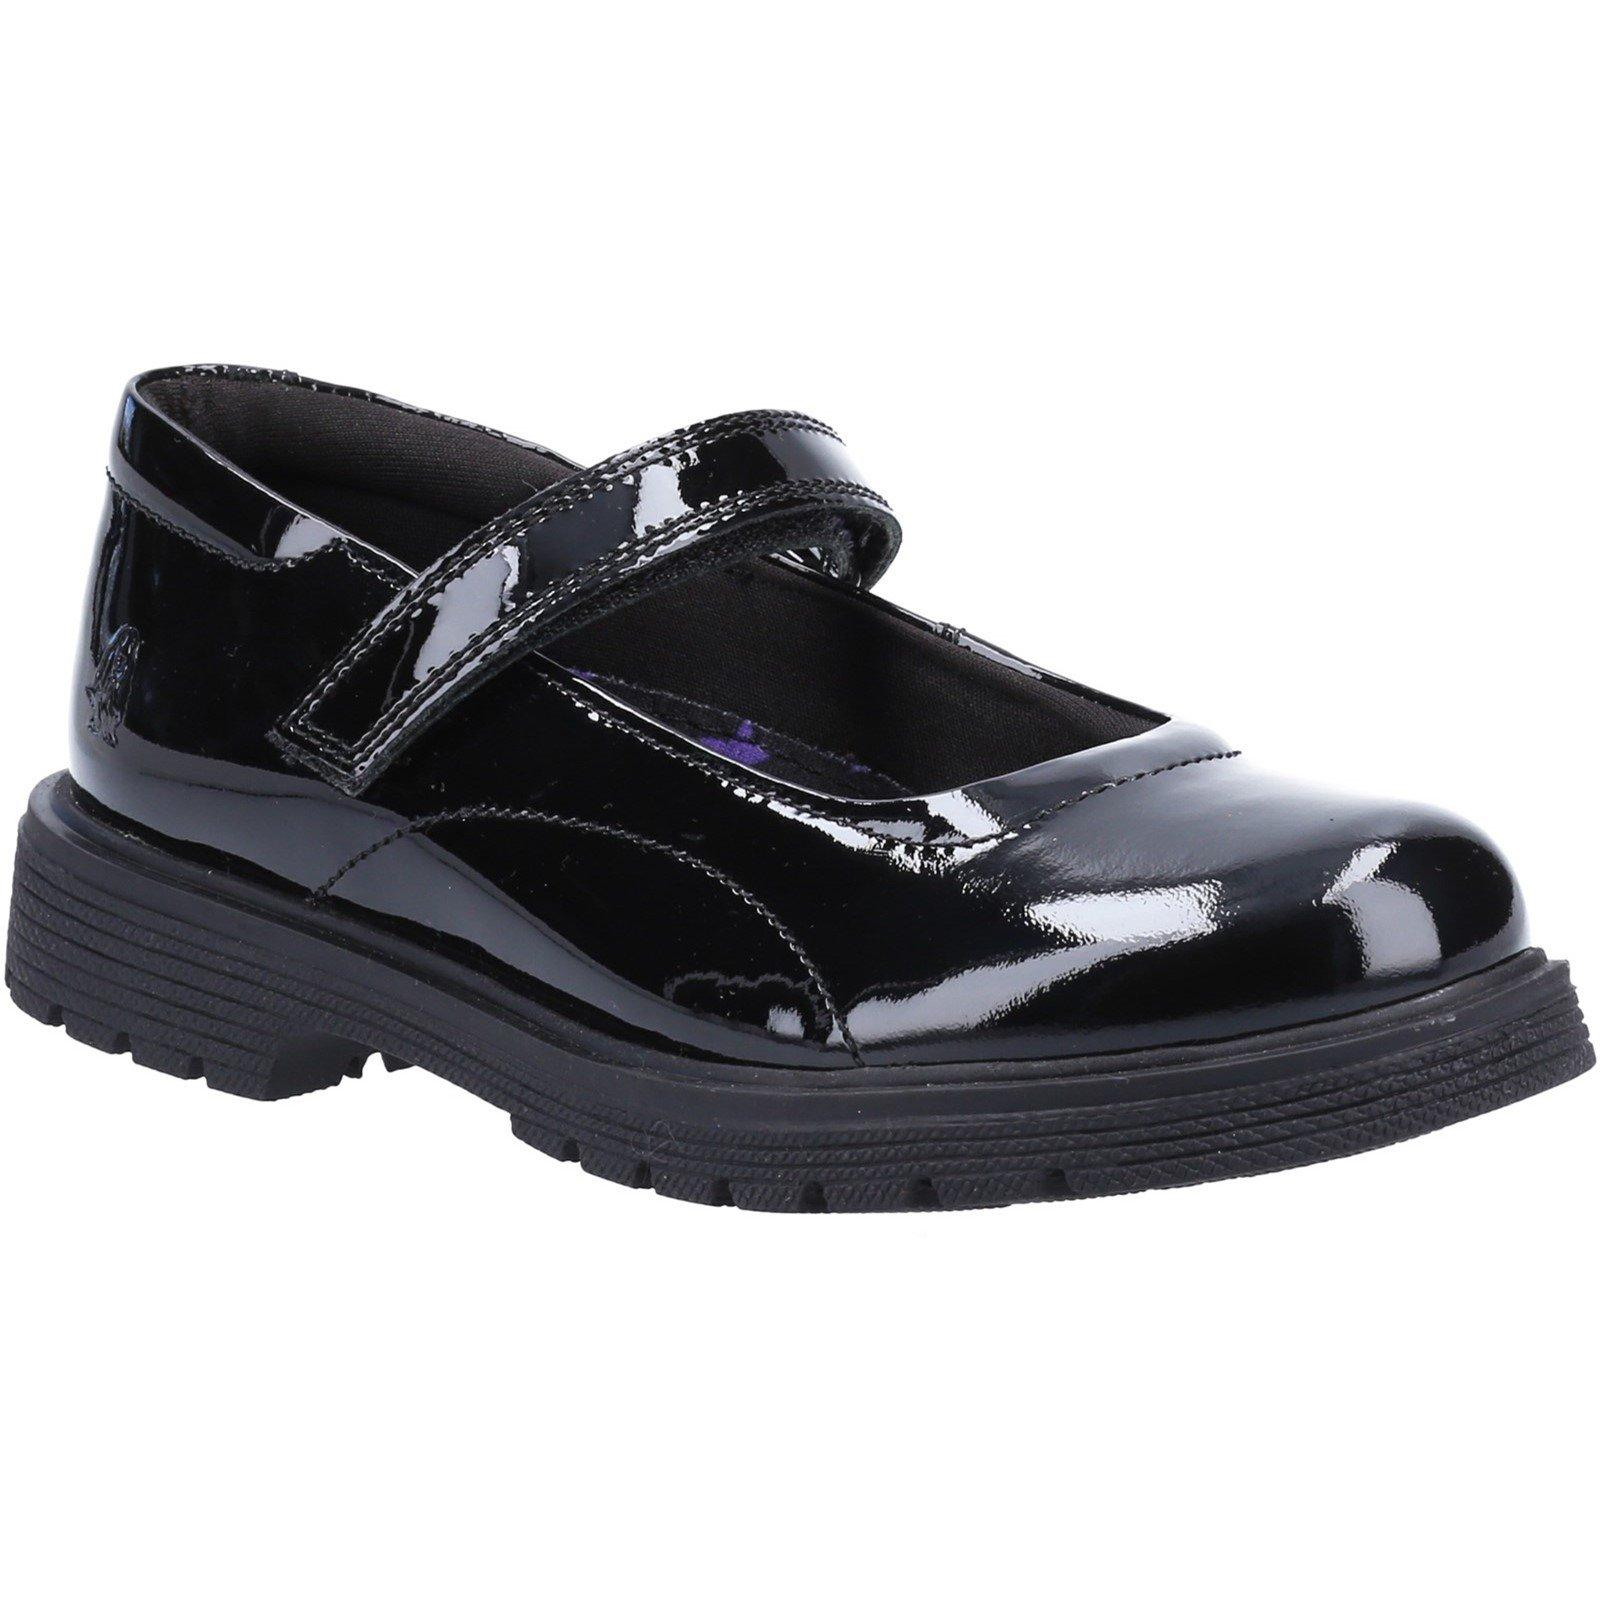 Hush Puppies Kid's Tally Junior School Shoe Patent Black 32814 - Patent Black 11